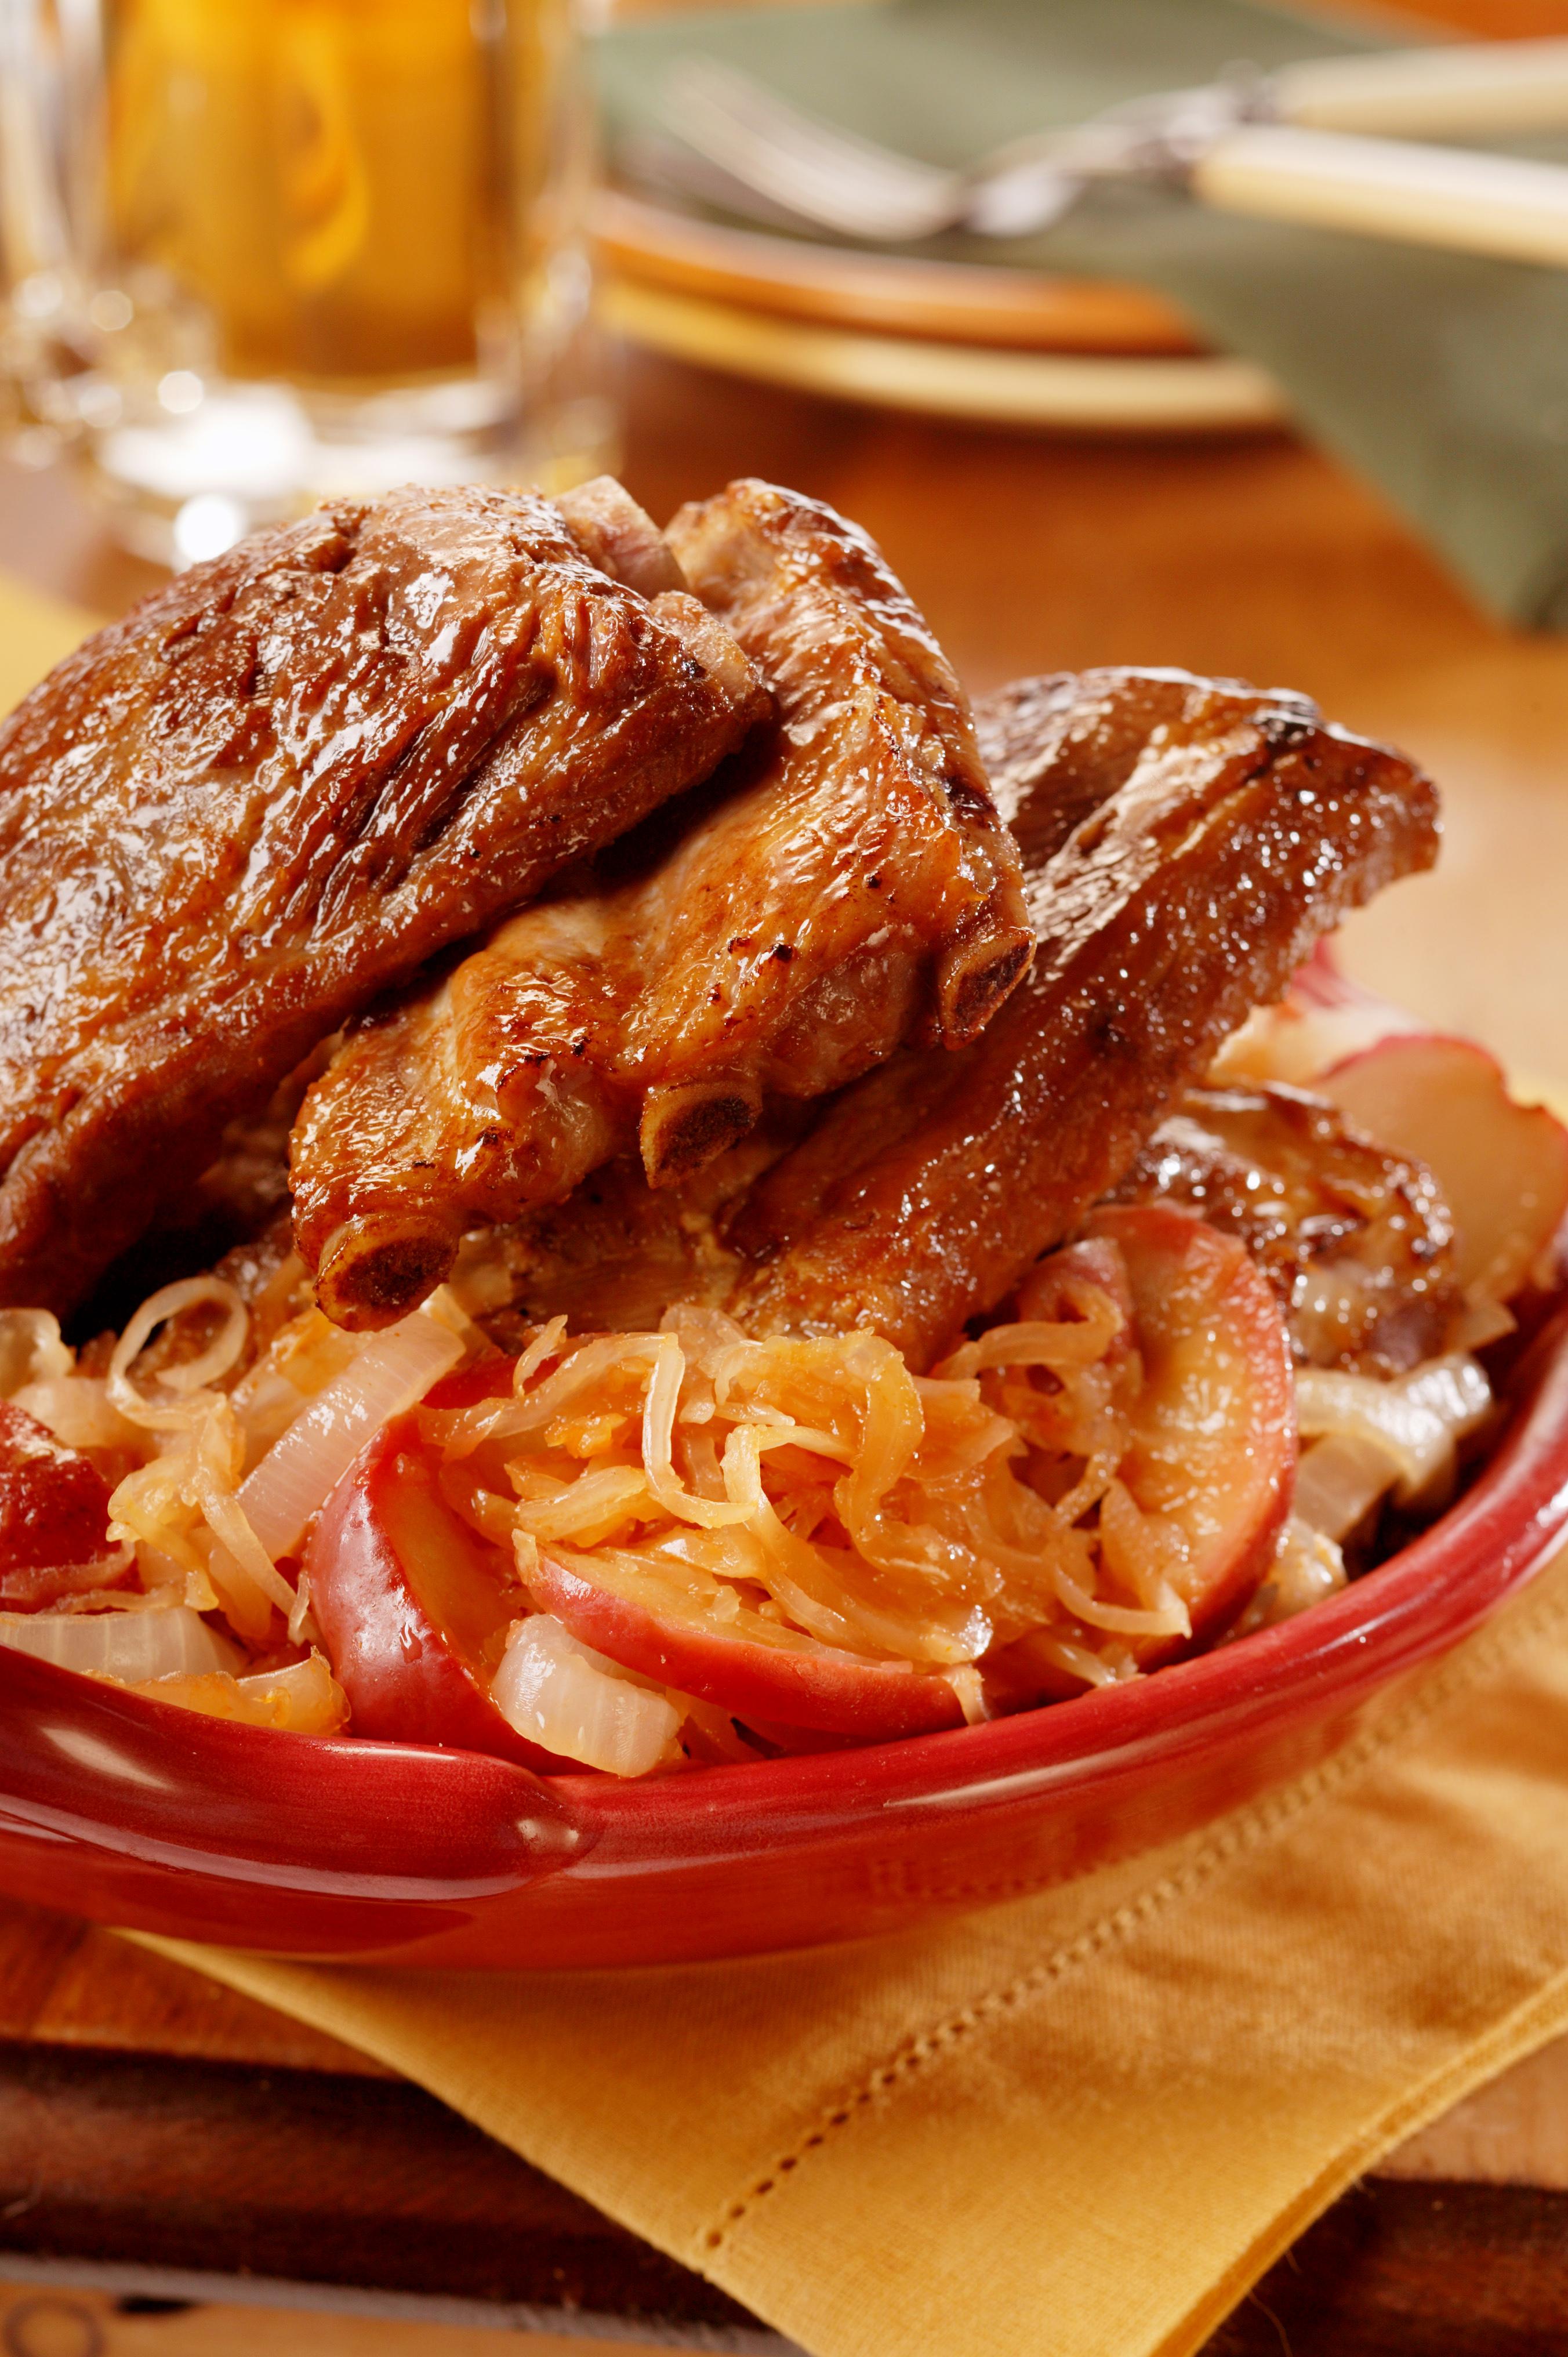 Oktoberfest ribs with apple sauerkraut pork recipes pork be inspired - Appel krat ...